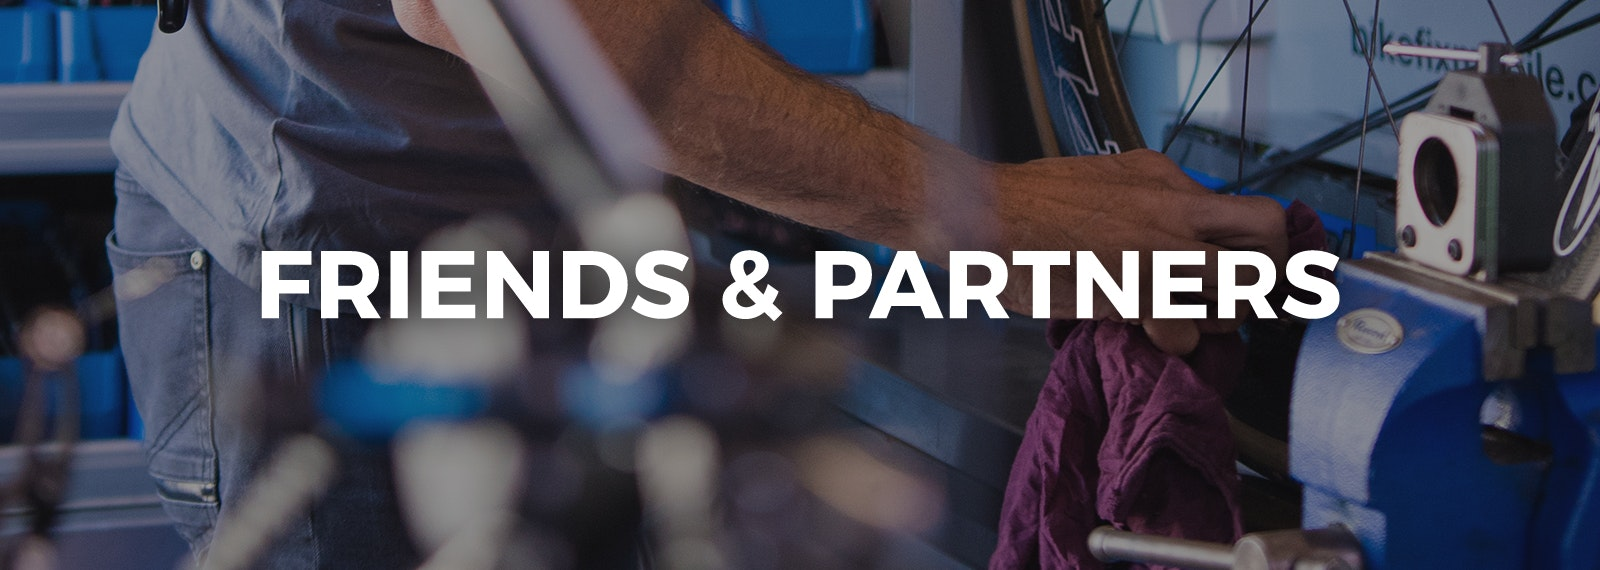 Friends & Partners